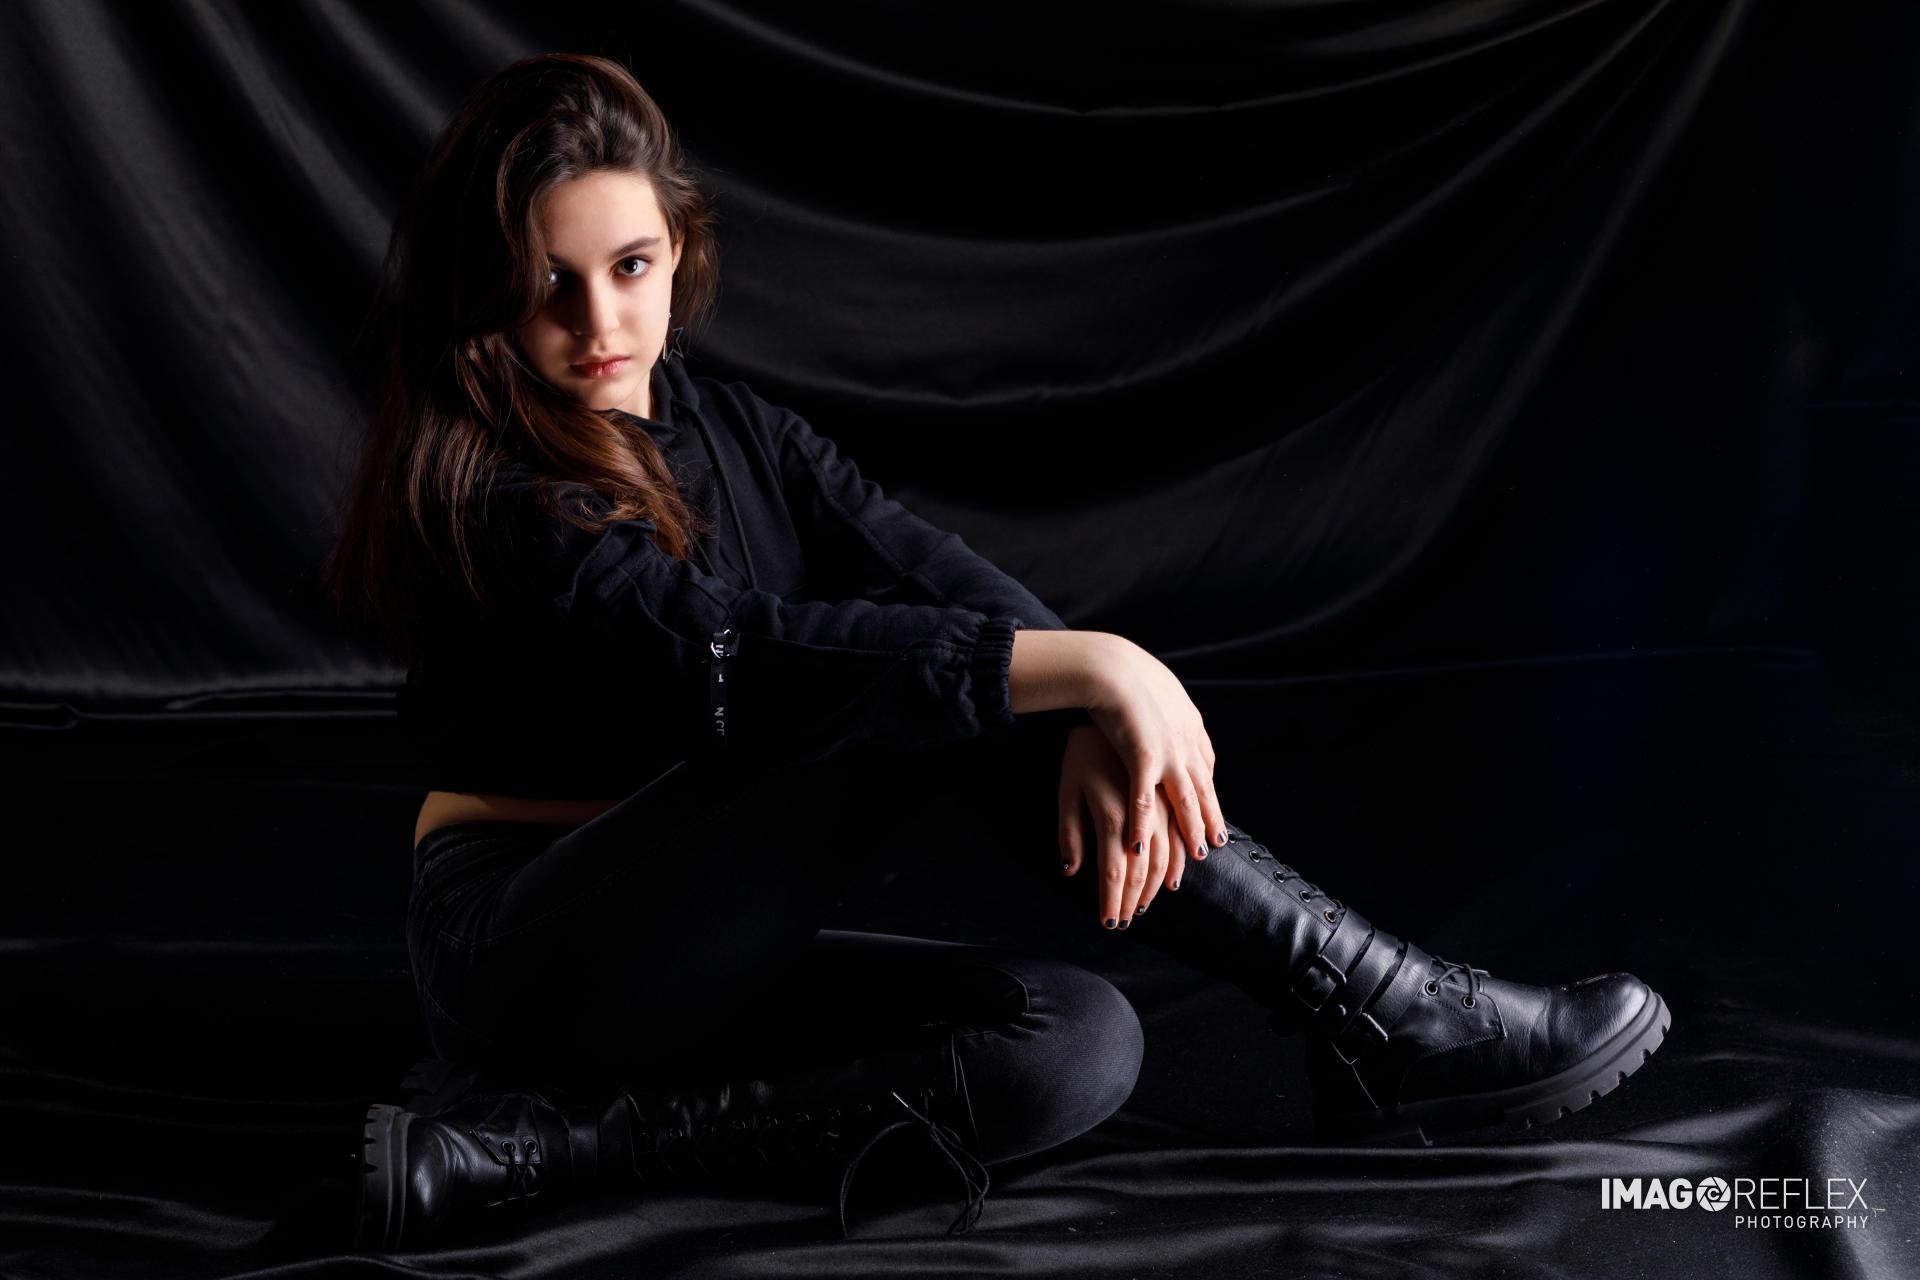 Nicole Pizzi